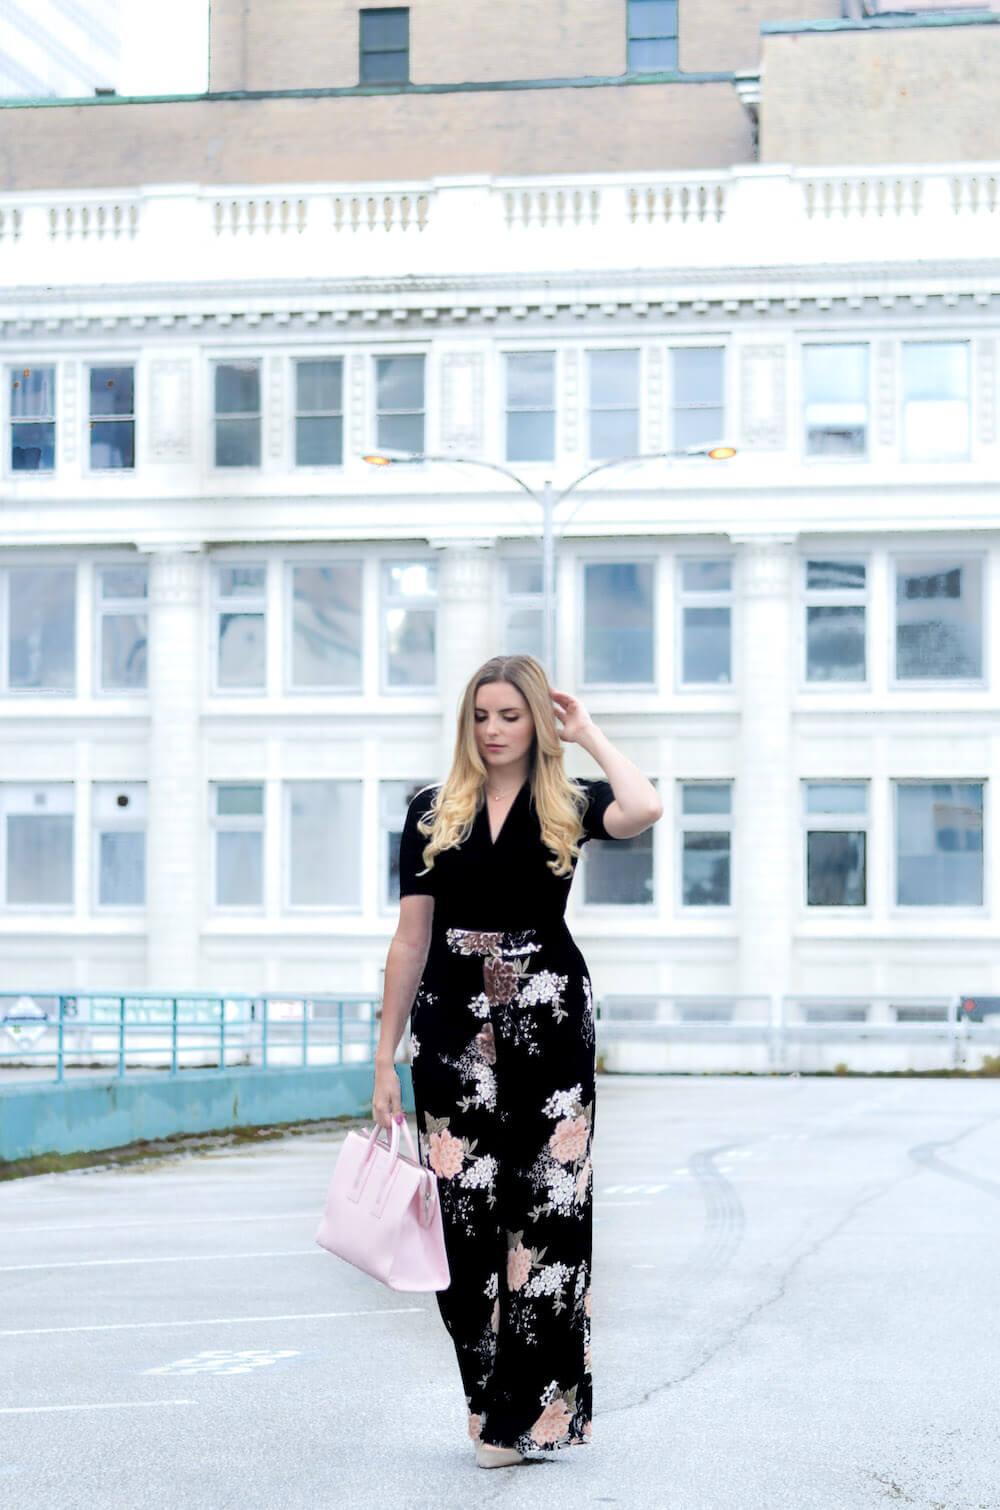 vancouver style blog, vancouver, fashion blog, vancouver blog, vancouver fashion bloggers, best vancouver fashion blog, fashion blog, vancouver style blogger, vancouver style bloggers, vancouver lifestyle blog, vancouver travel blog, canadian fashion blog, canadian style blog, canadian travel blog, popular fashion blog, popular style blog, how to style palazzo pants, floral palazzo pants, dynamite palazzo pants, HEIDI HIGH RISE WIDE LEG PALAZZO PANT dynamite, summer style essentials, summer office wear, summer office wear 2017, summer office outfits, summer office outfits 2017, cute summer outfits